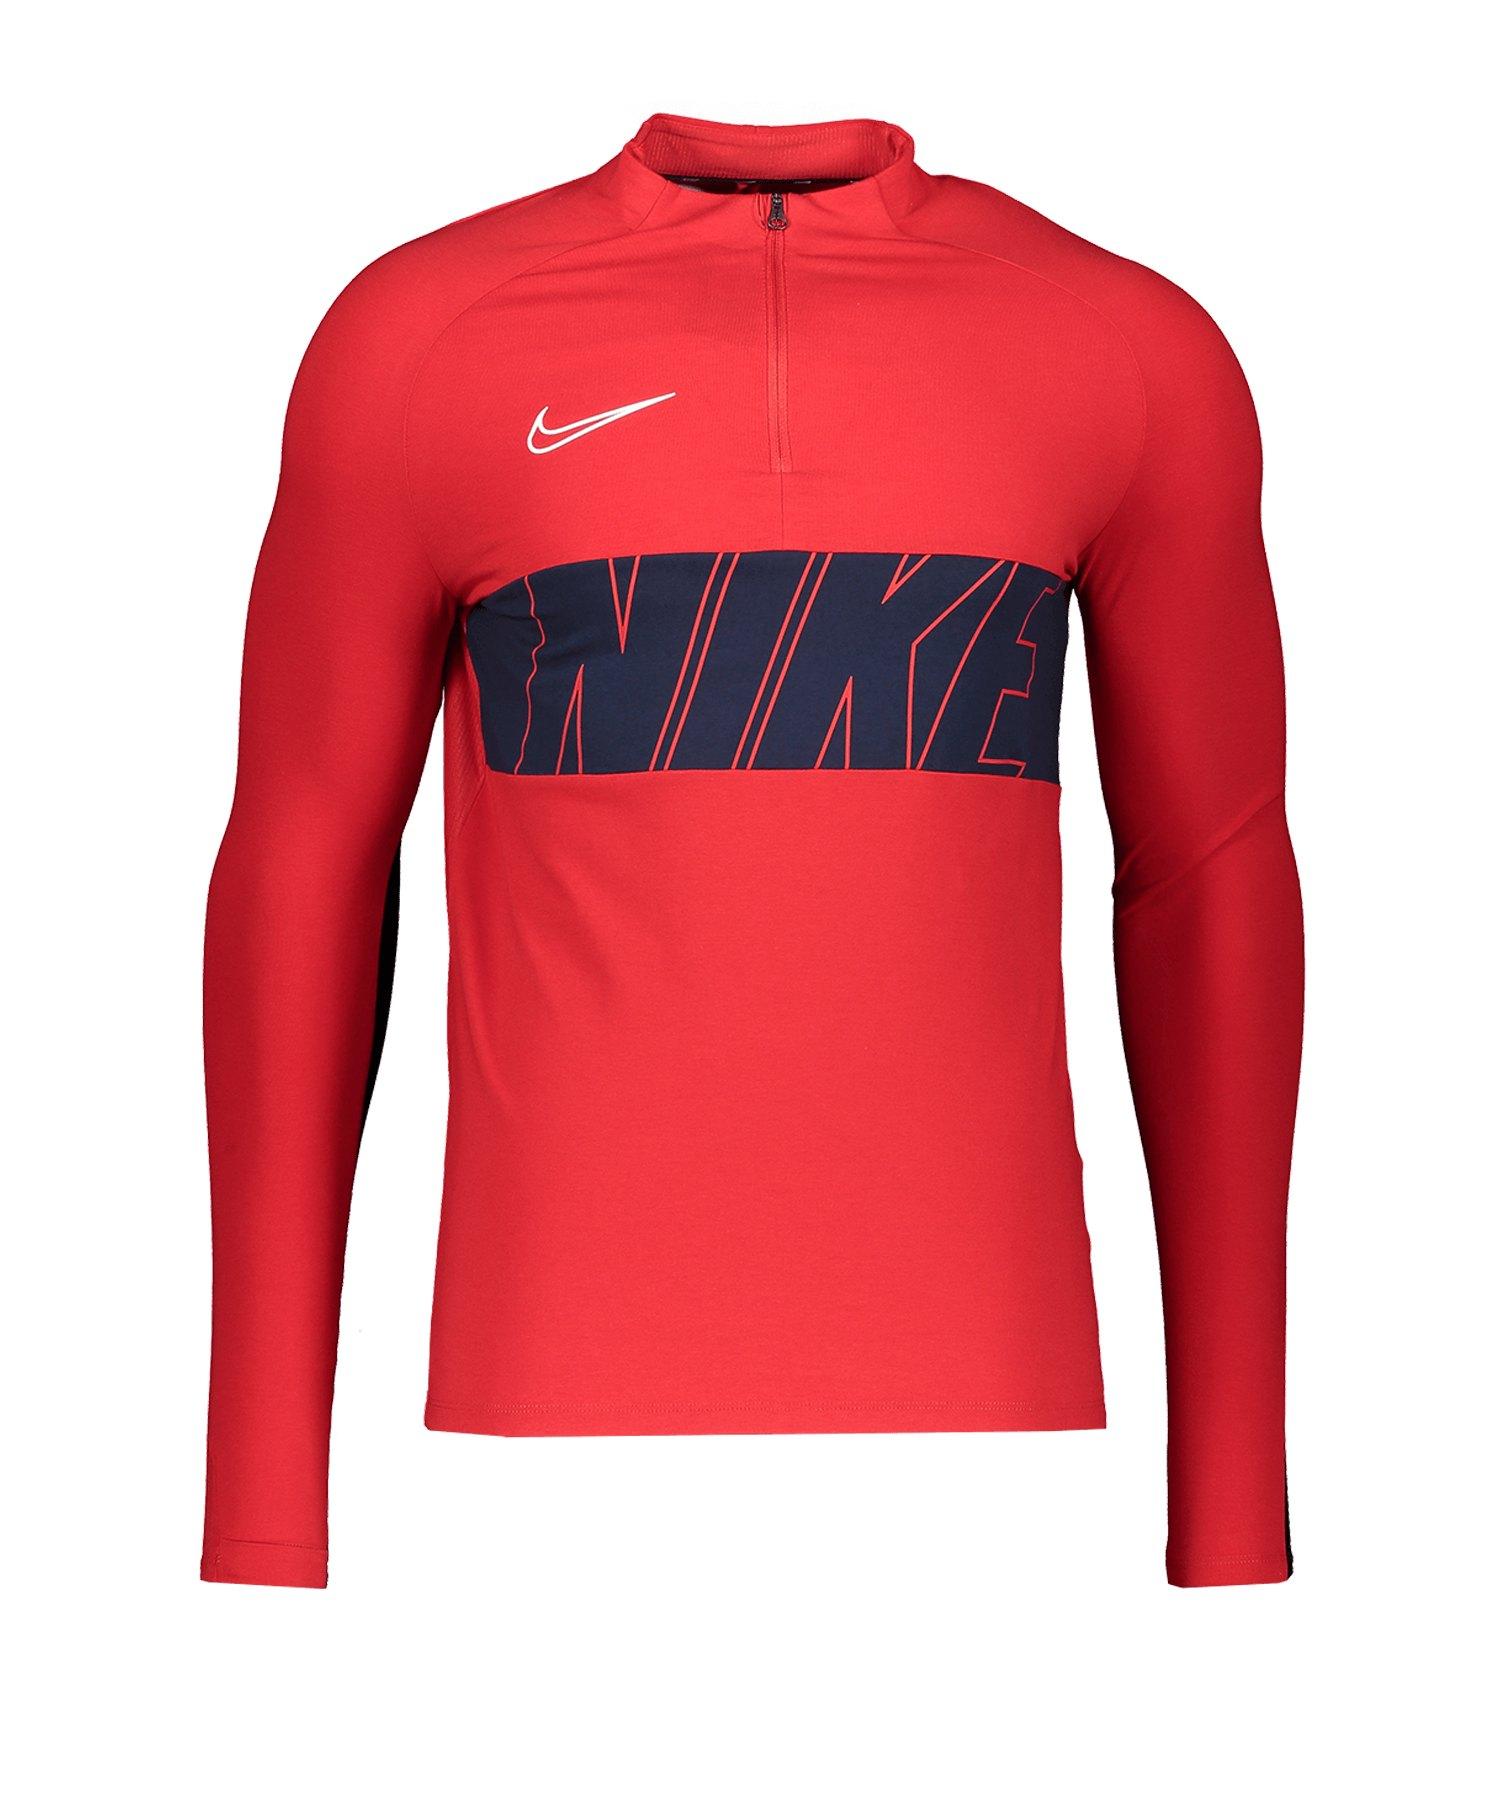 Nike Academy 1/4 Zip Drill Top LS F657 - rot